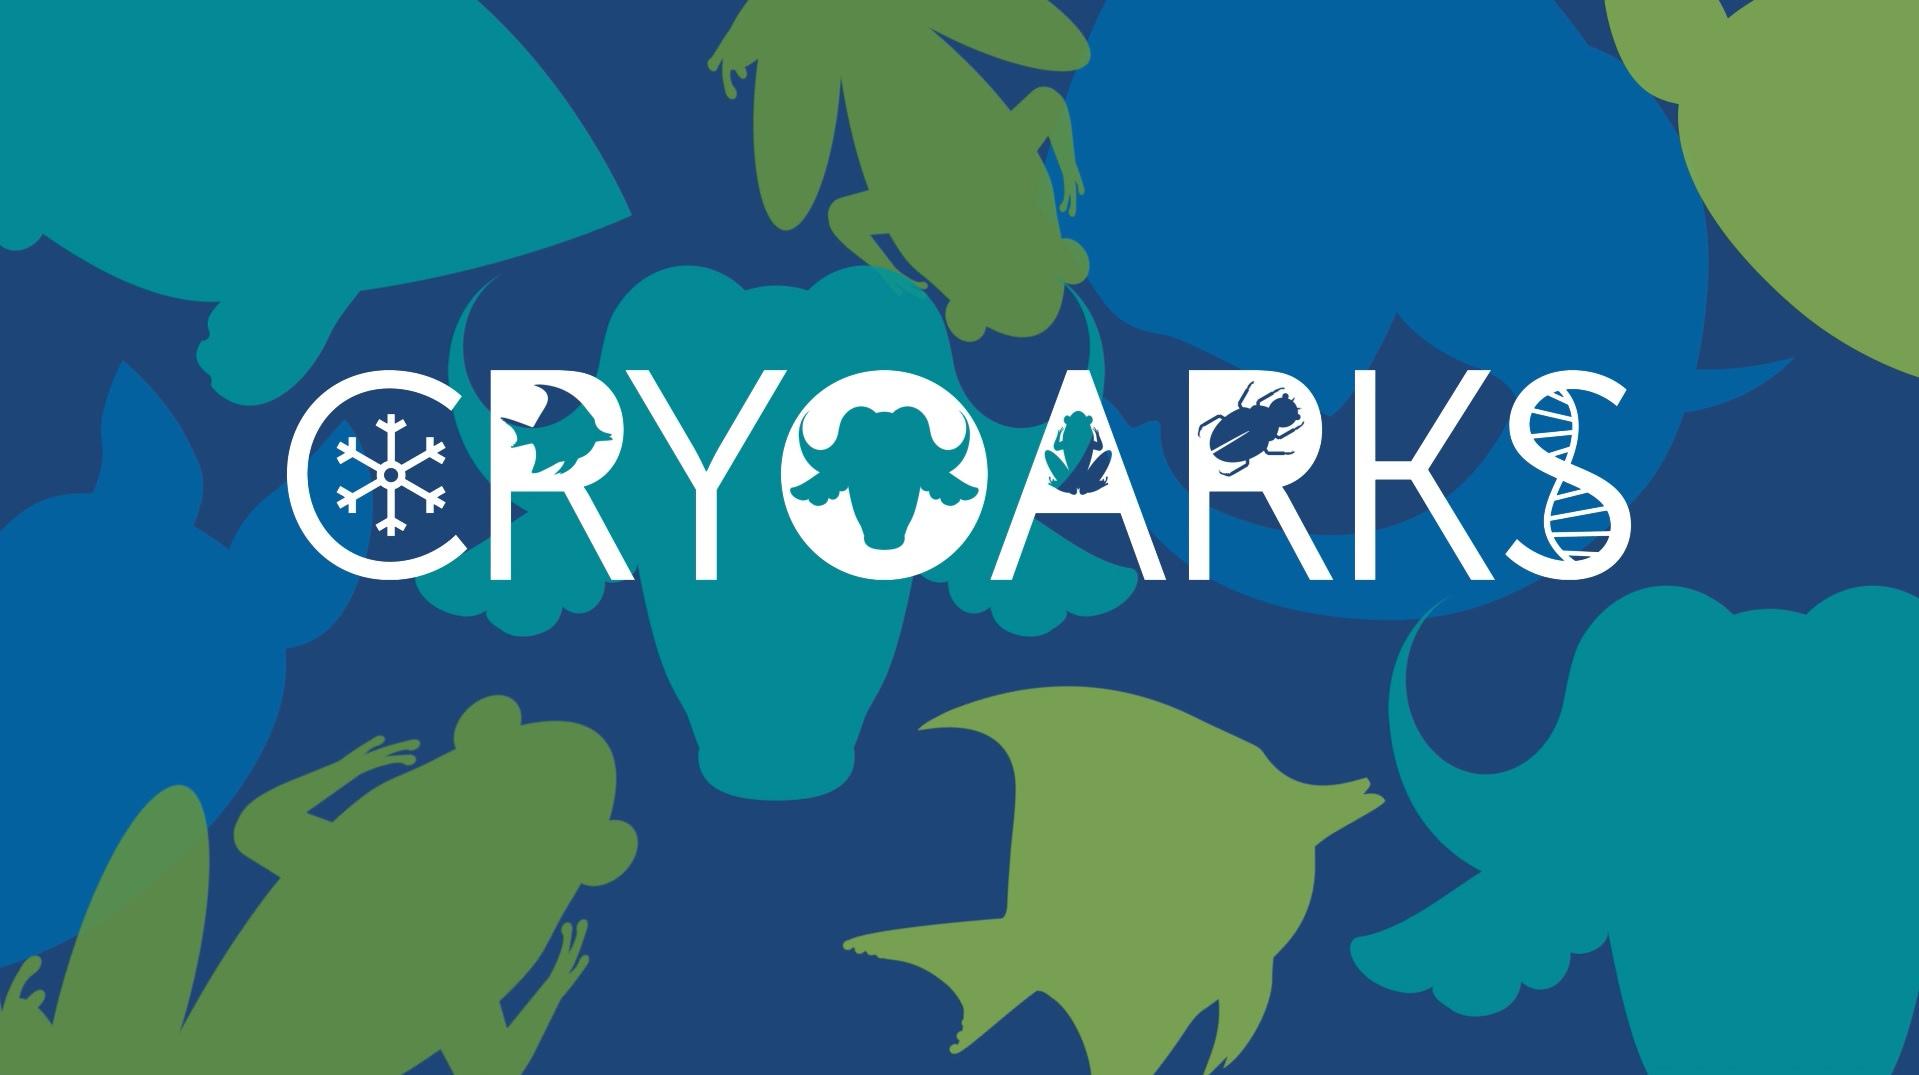 New CryoArks Animation Film